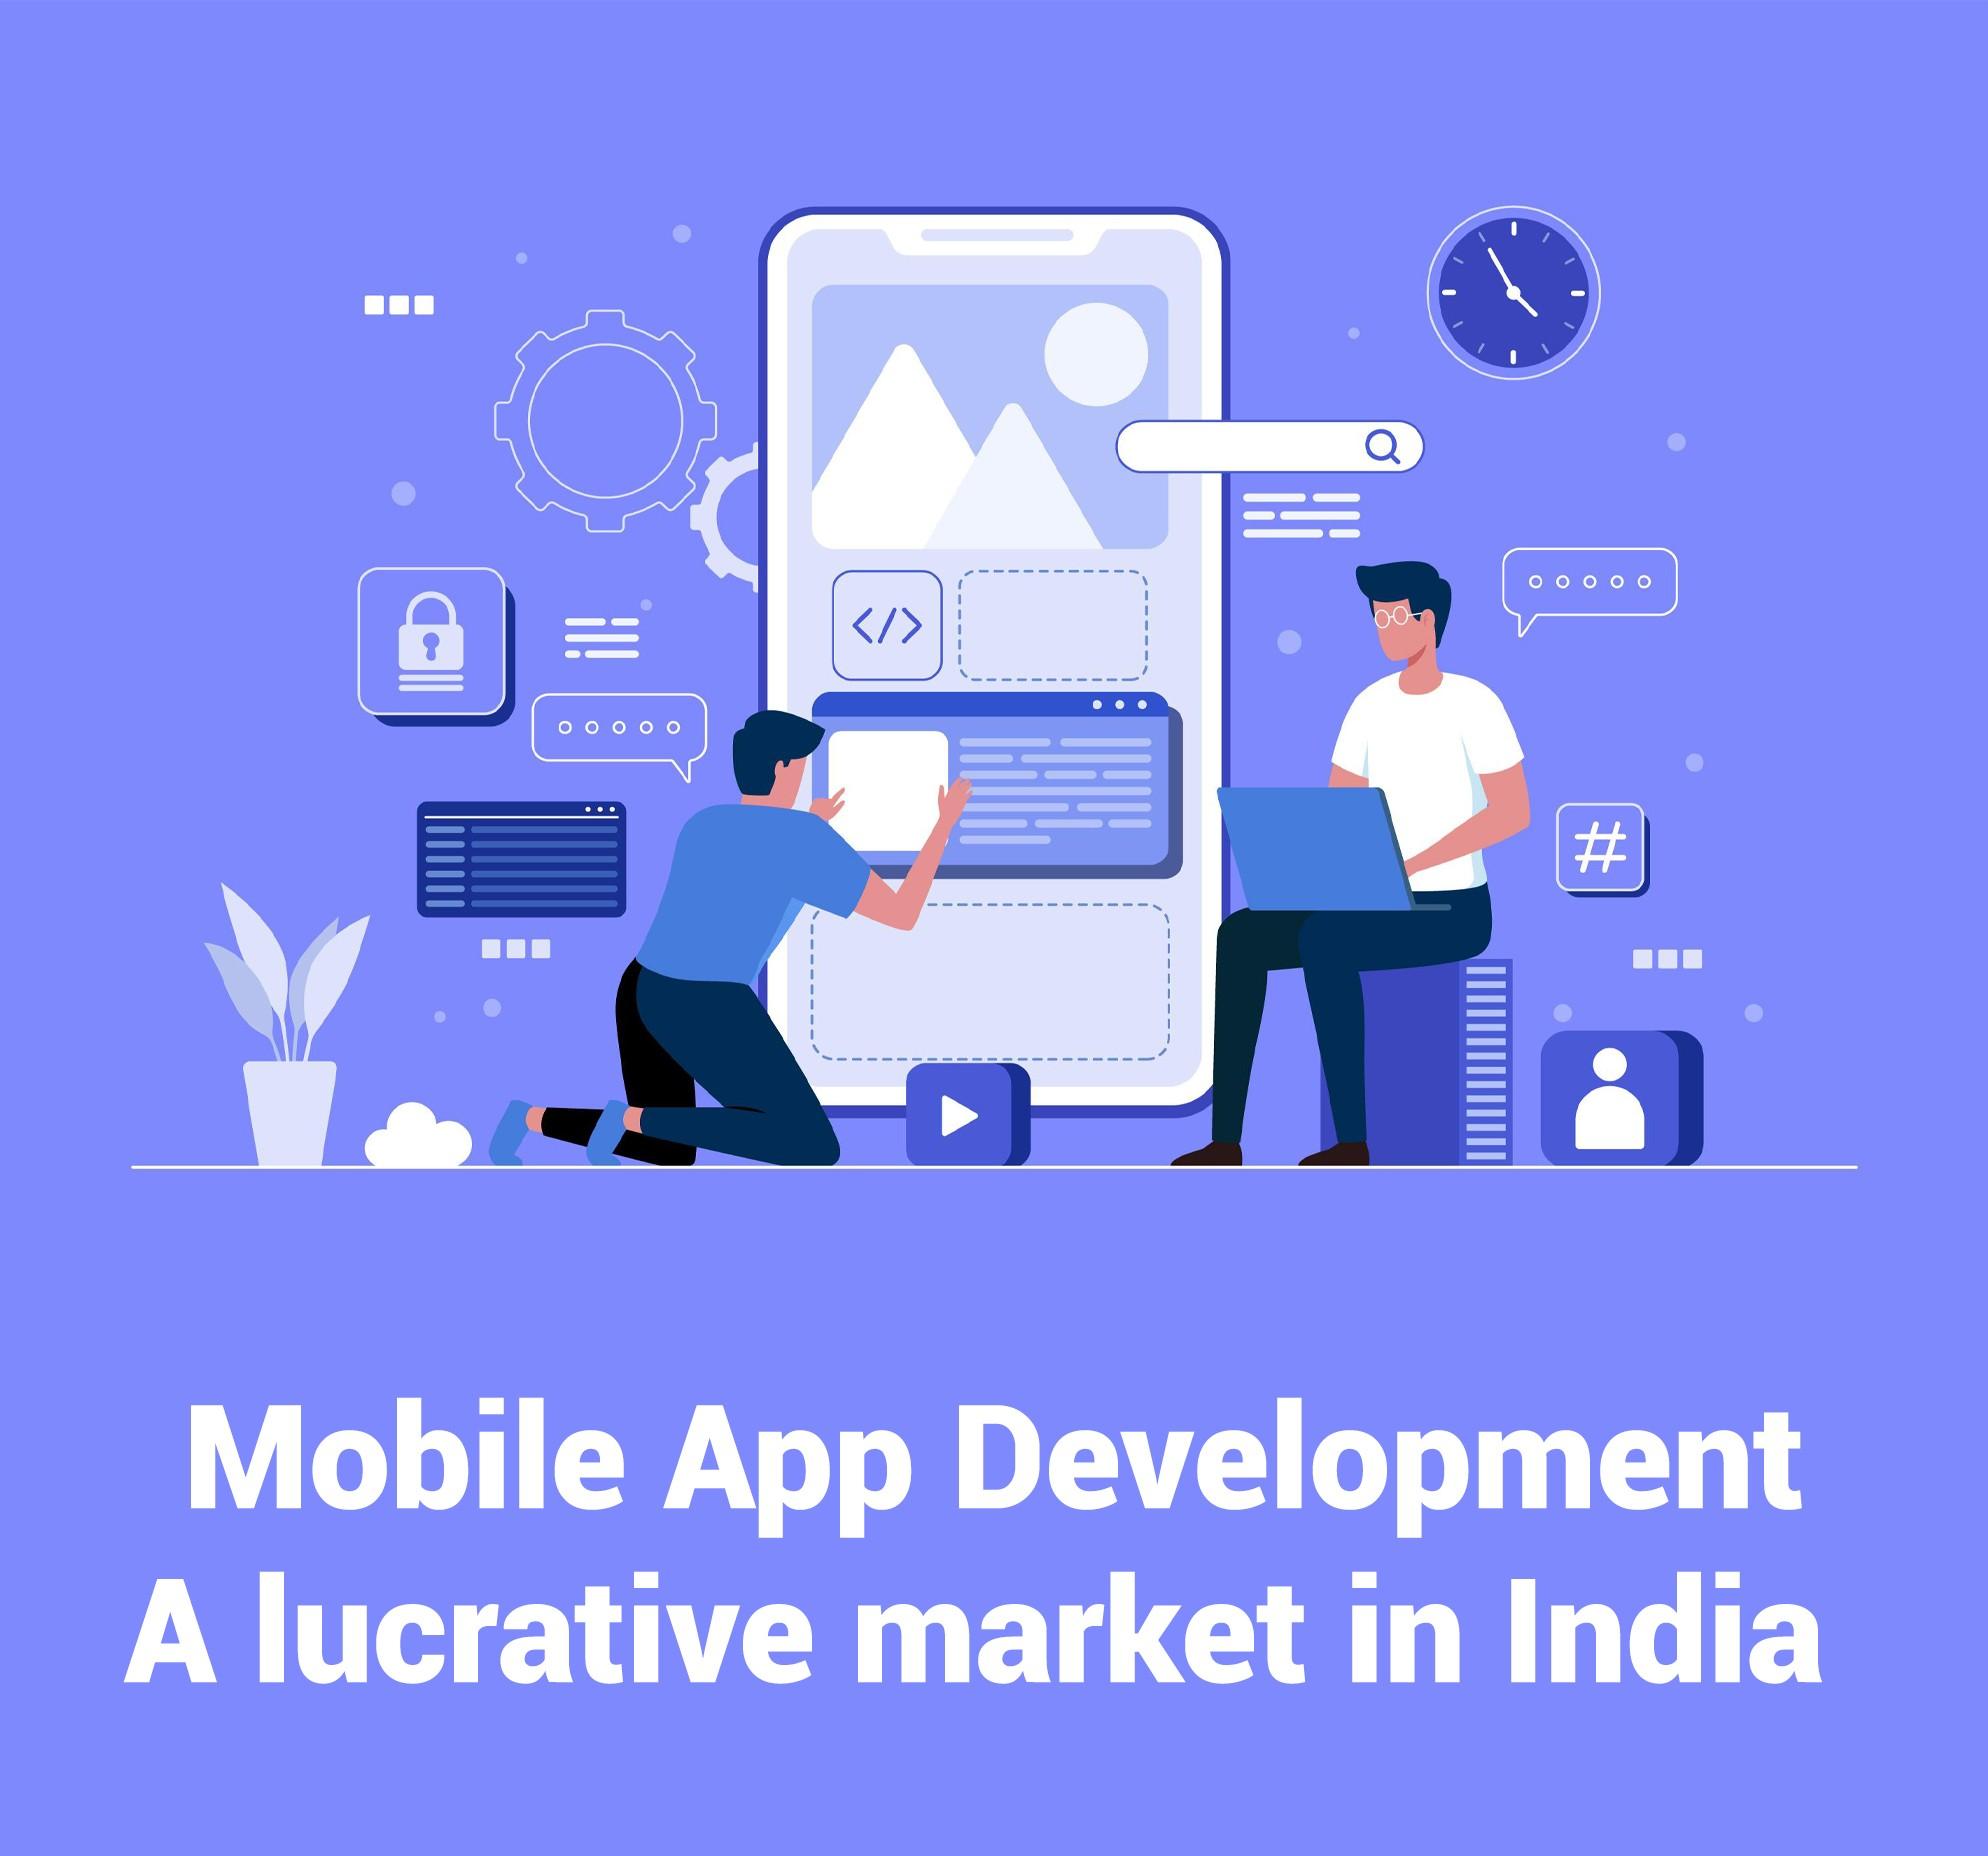 Mobile App Development- A lucrative market in India